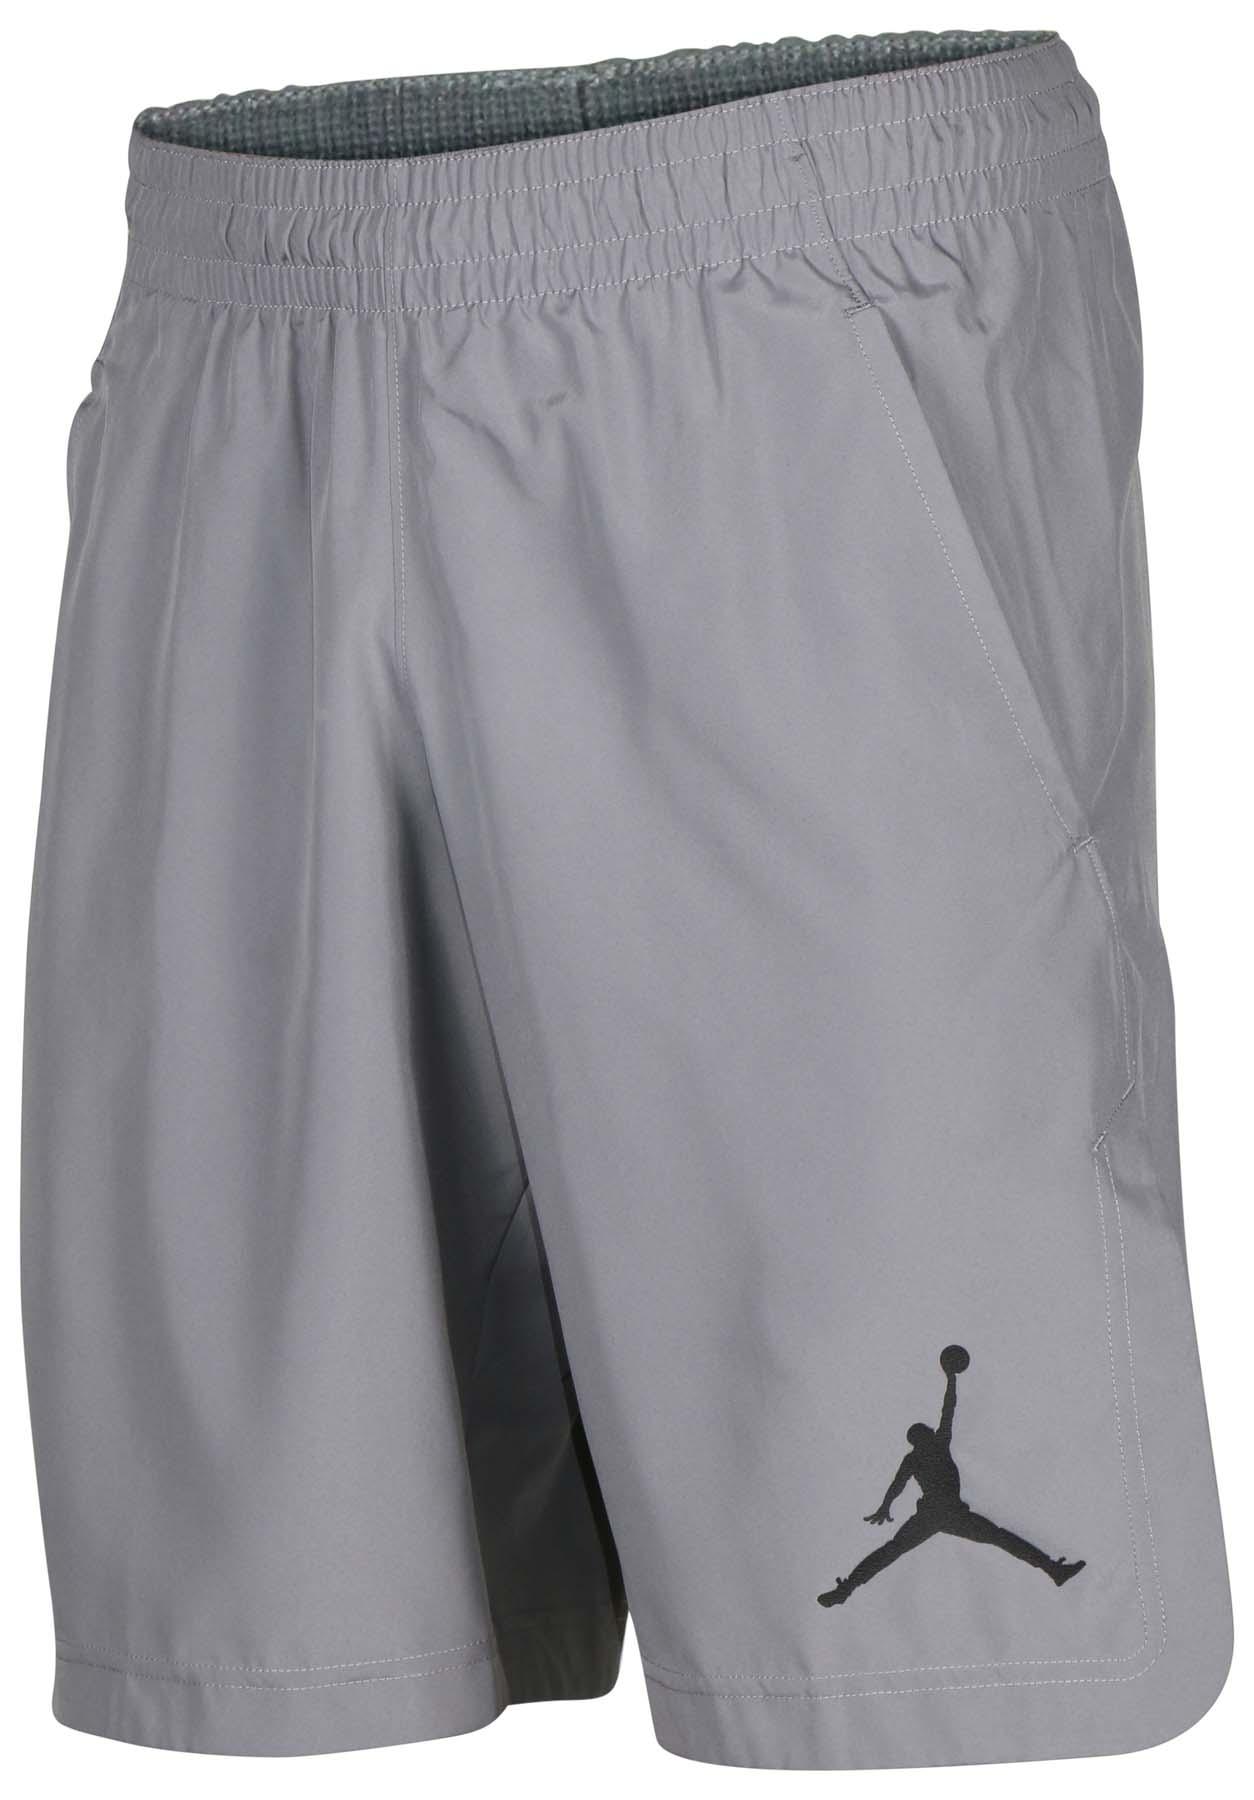 c893633b5f0 Nike Dri FIT Men s Woven 9 Training Shorts Source · Jordan Para Hombre Nike  Flex Entrenamiento Pantalones Cortos Gris eBay